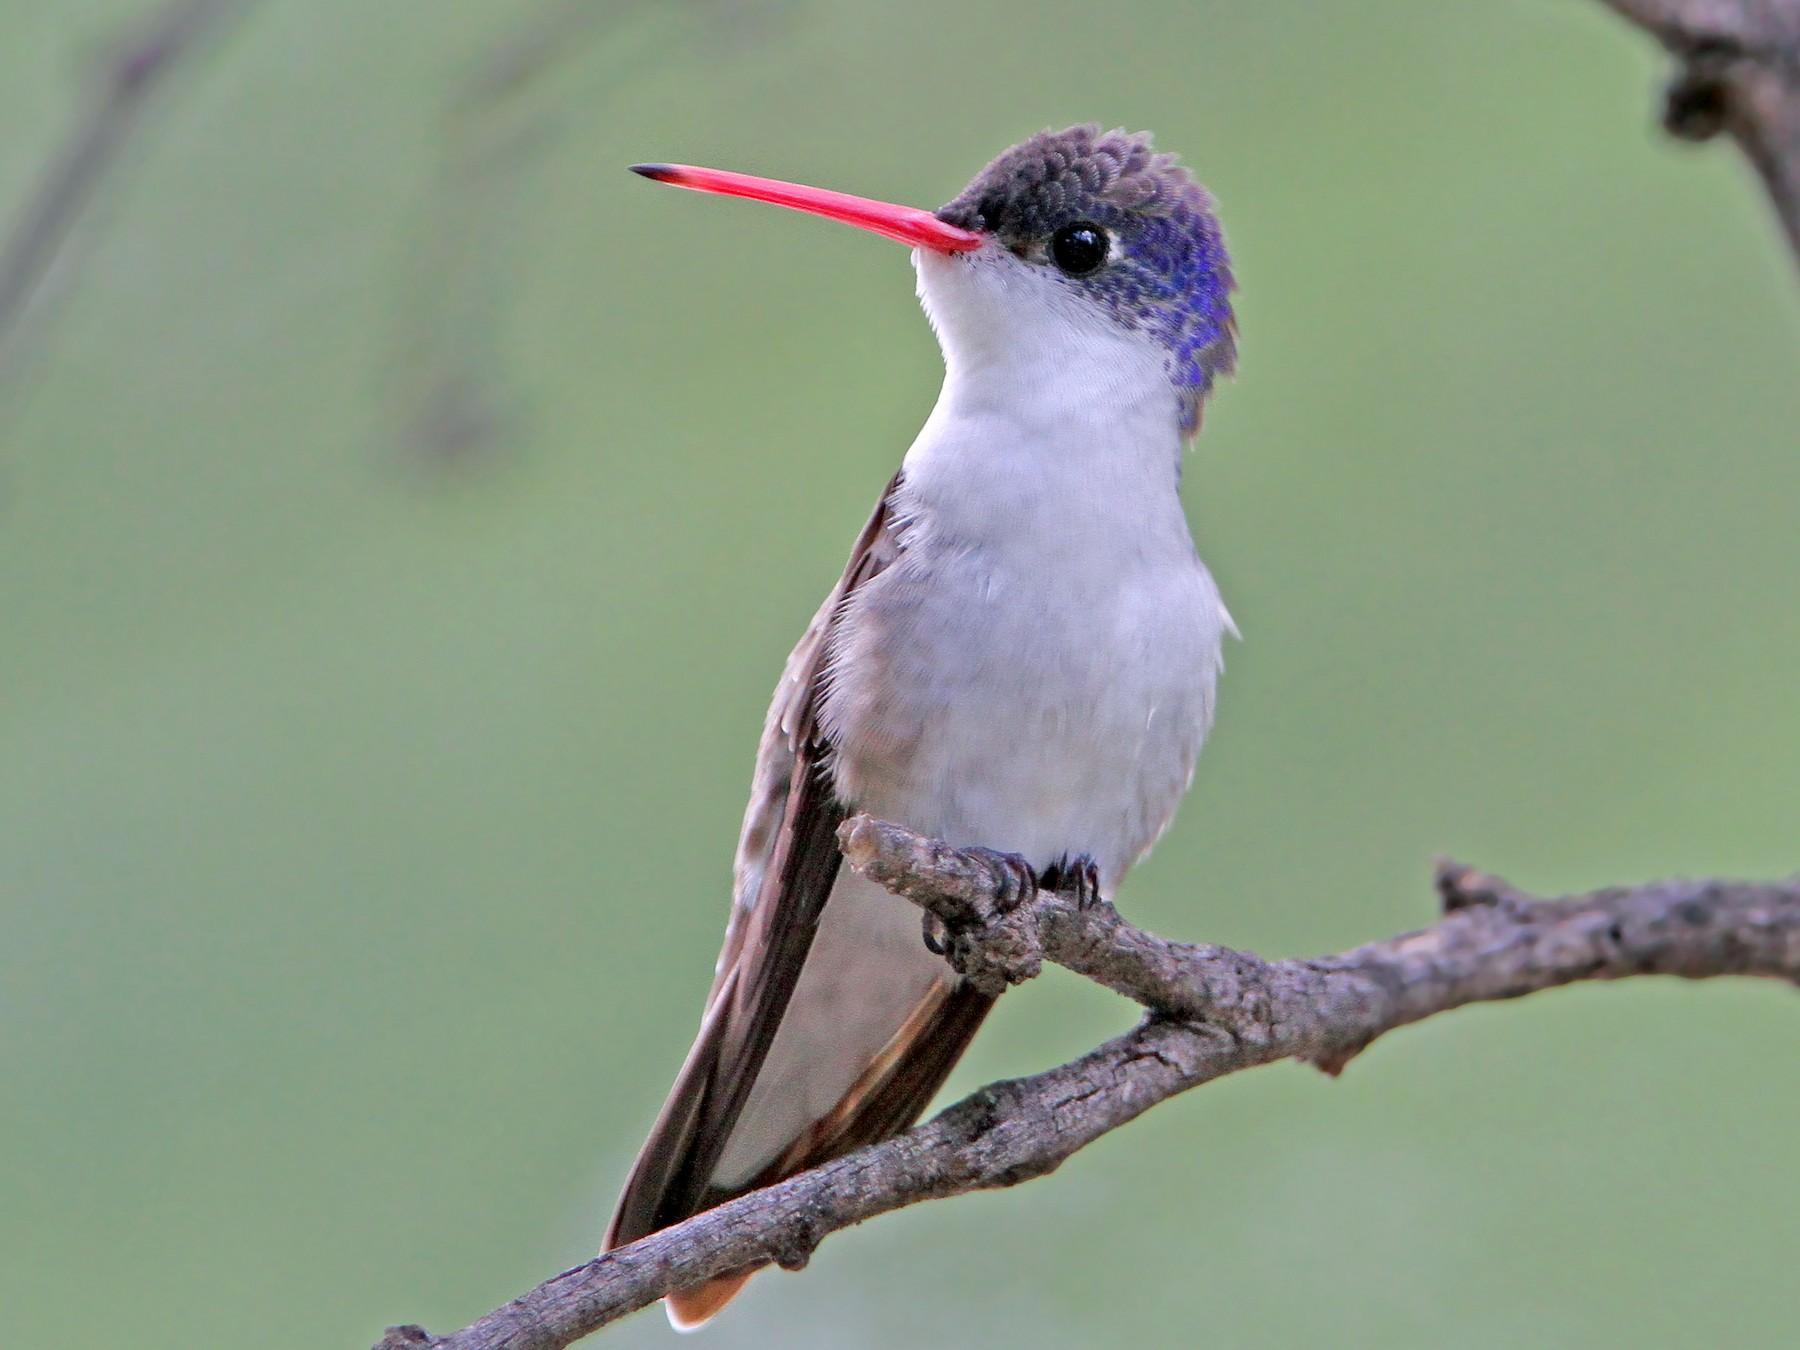 Violet-crowned Hummingbird - Christoph Moning